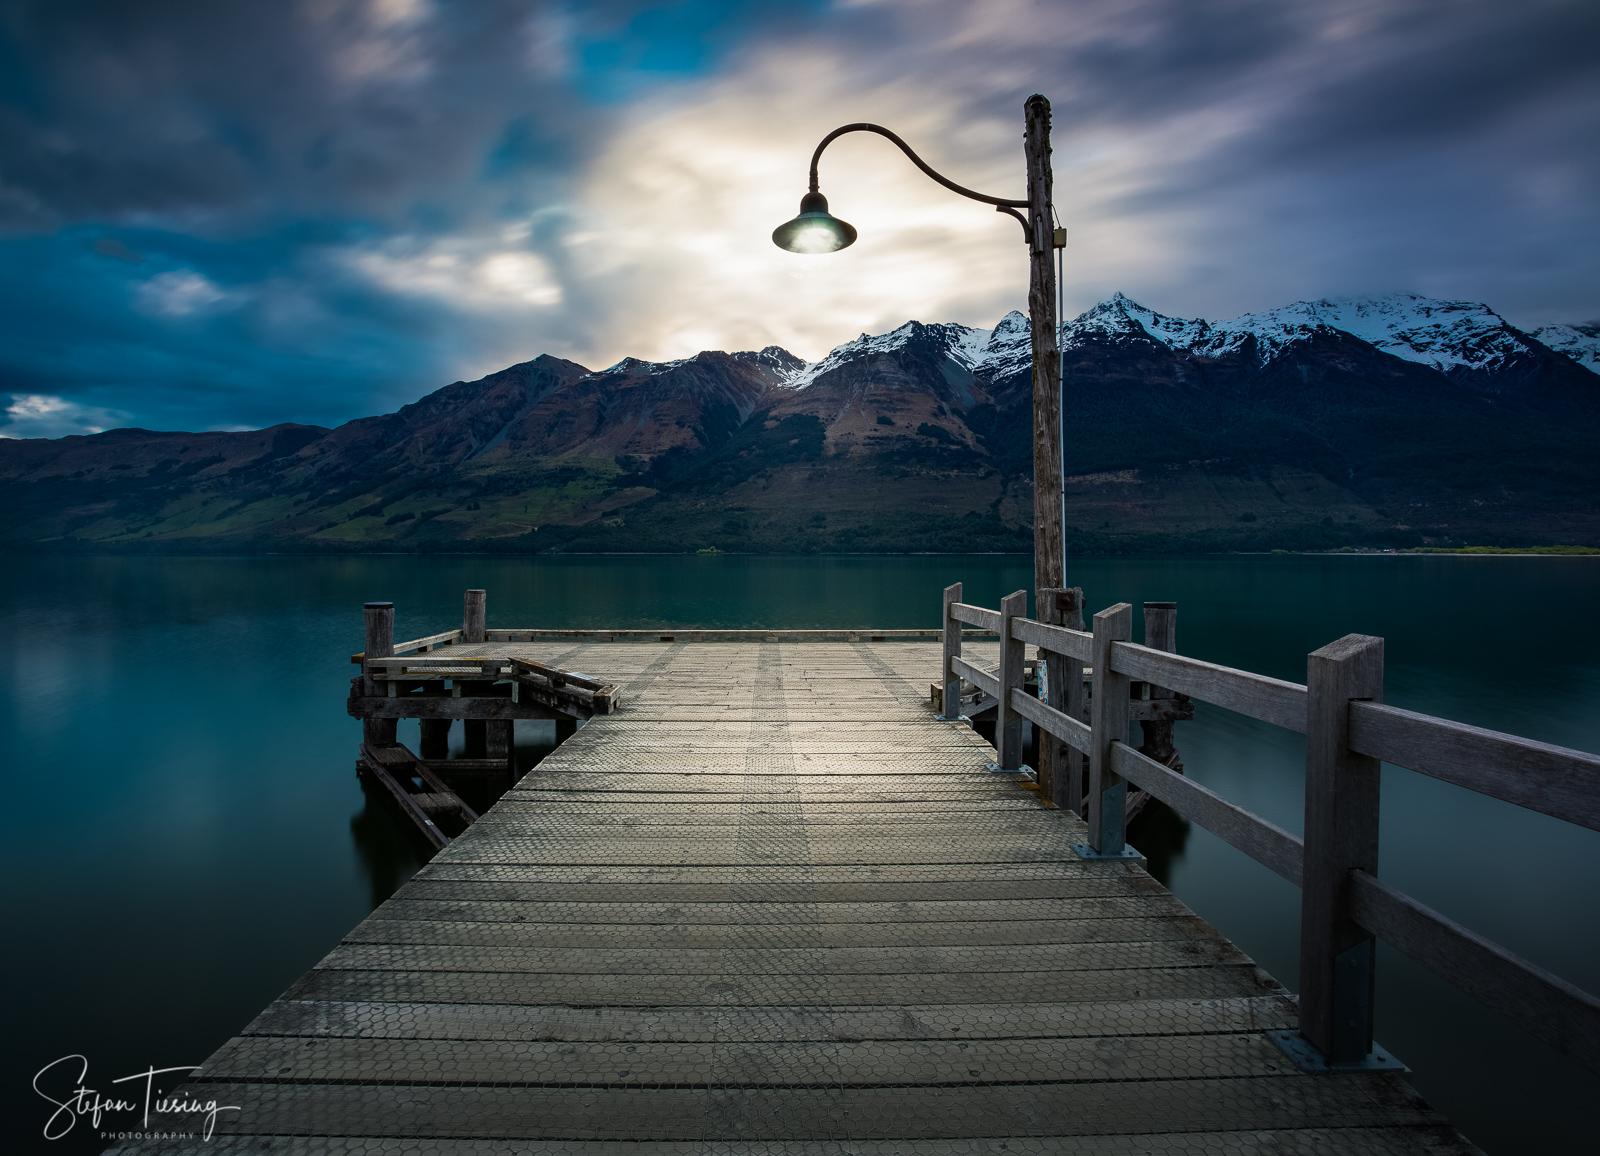 Glenorchy Wharf, New Zealand